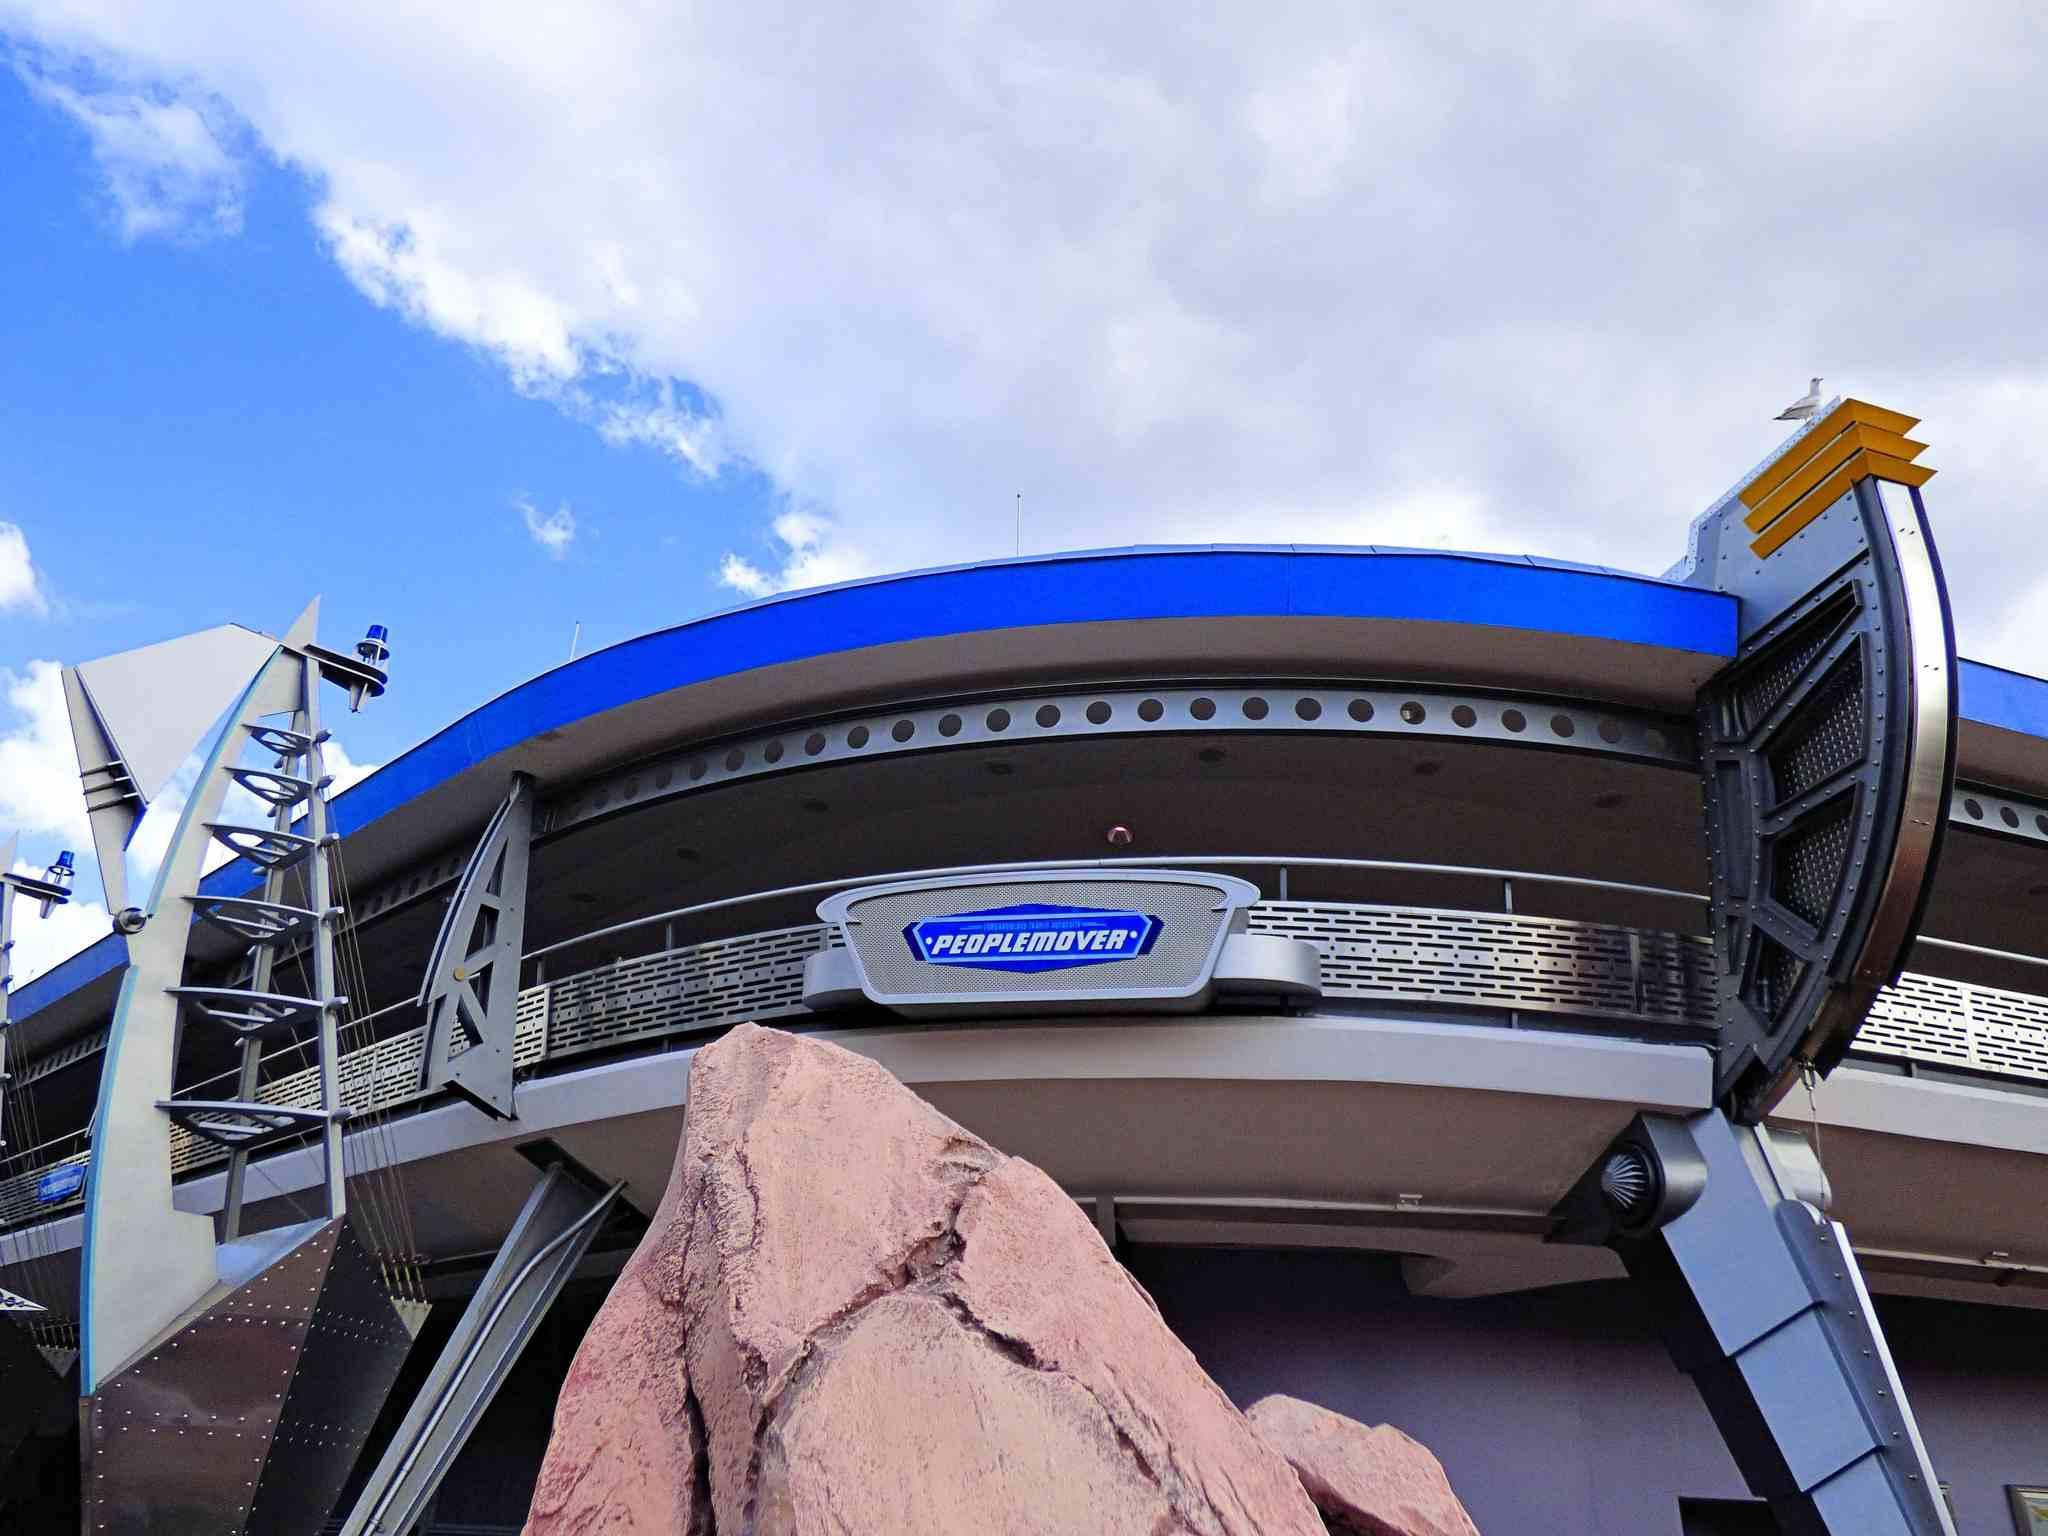 The Tomorrowland Transit Authority People Mover, Walt Disney World